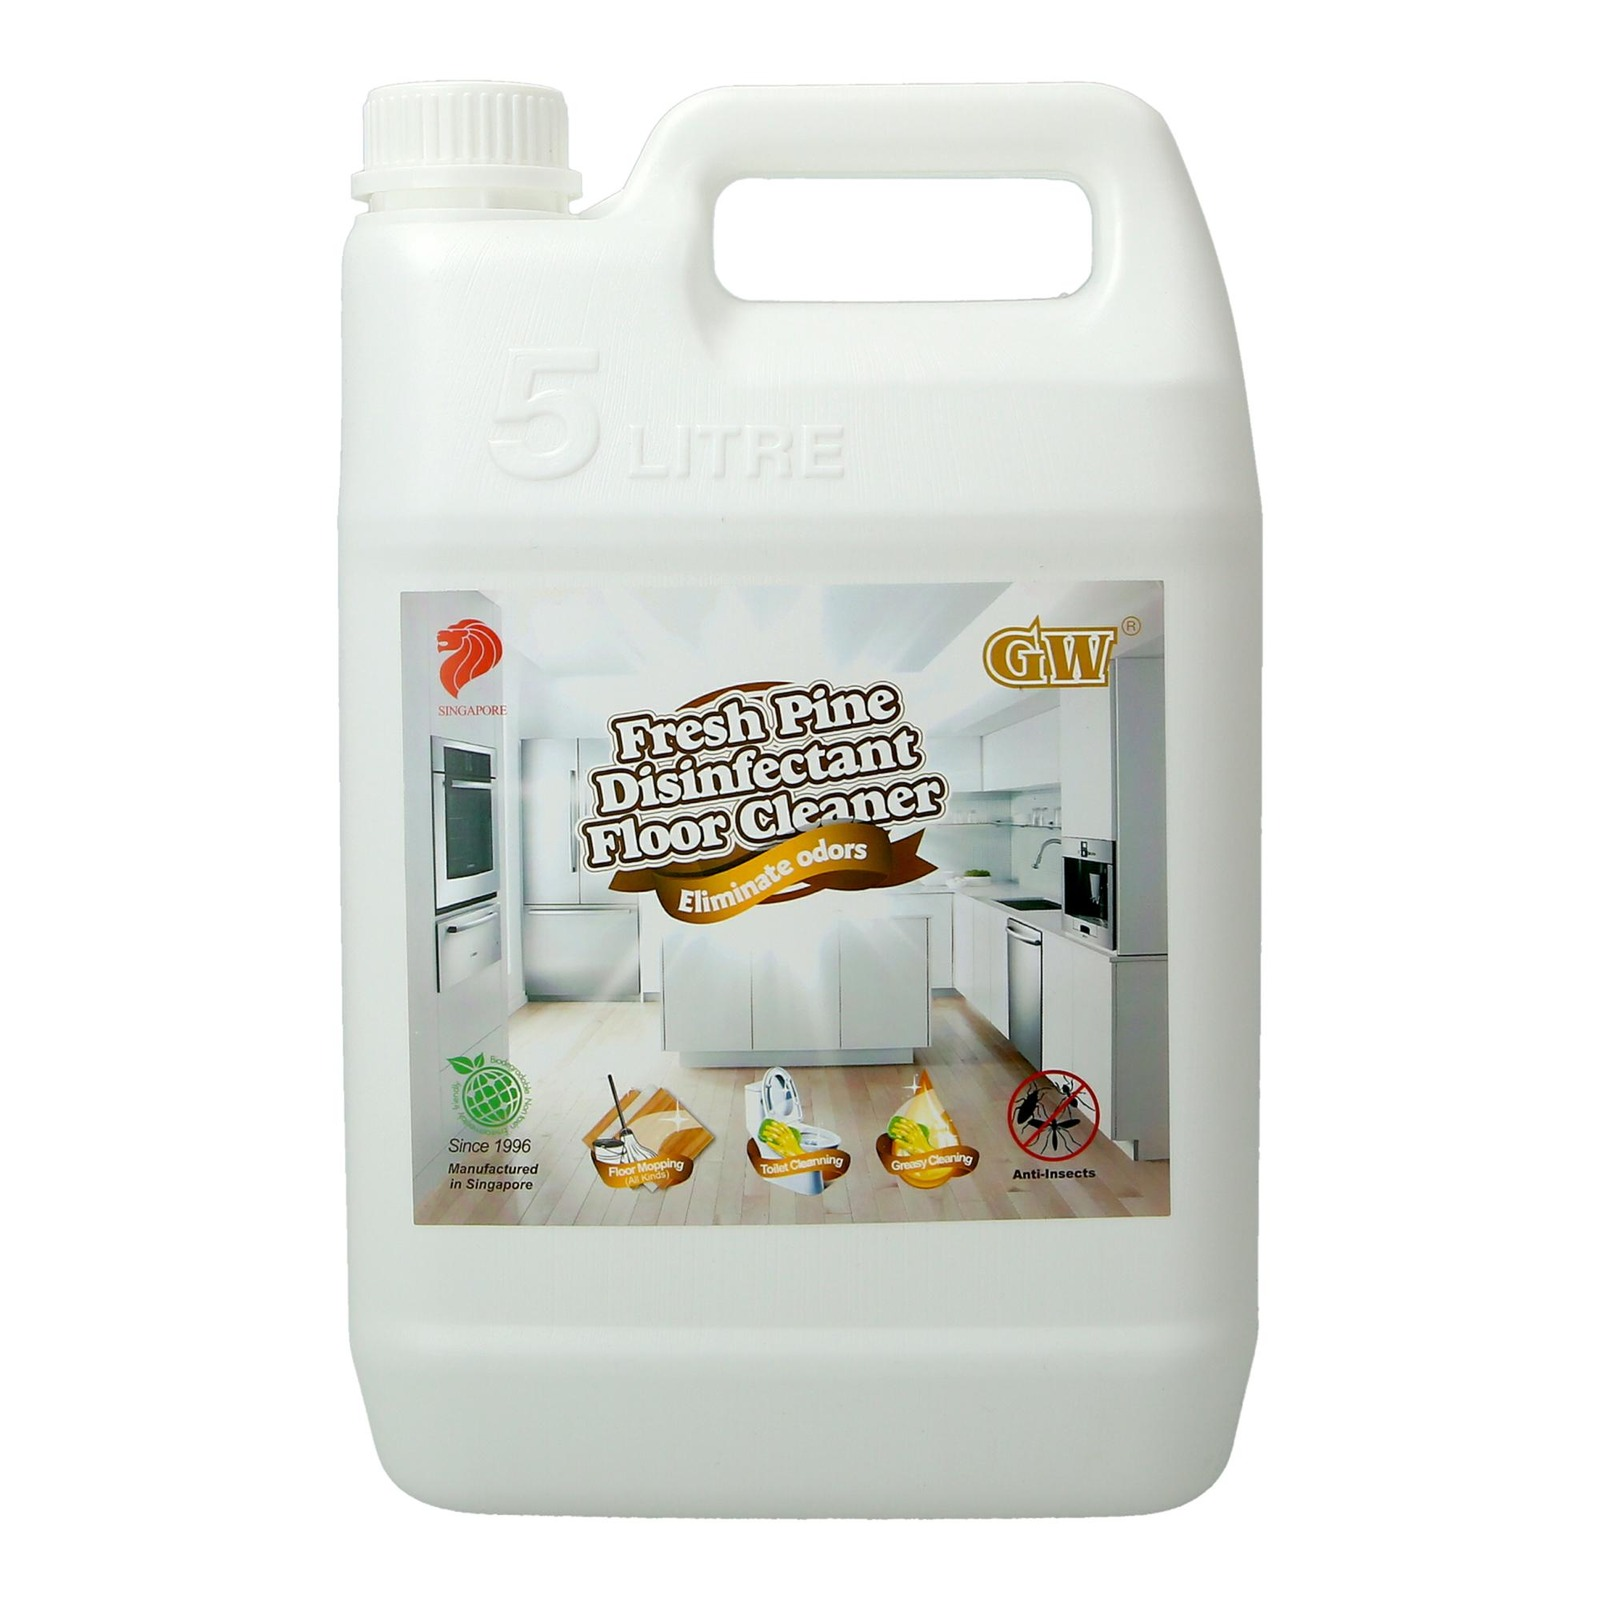 GW Disinfectant Floor Cleaner - Fresh Pine